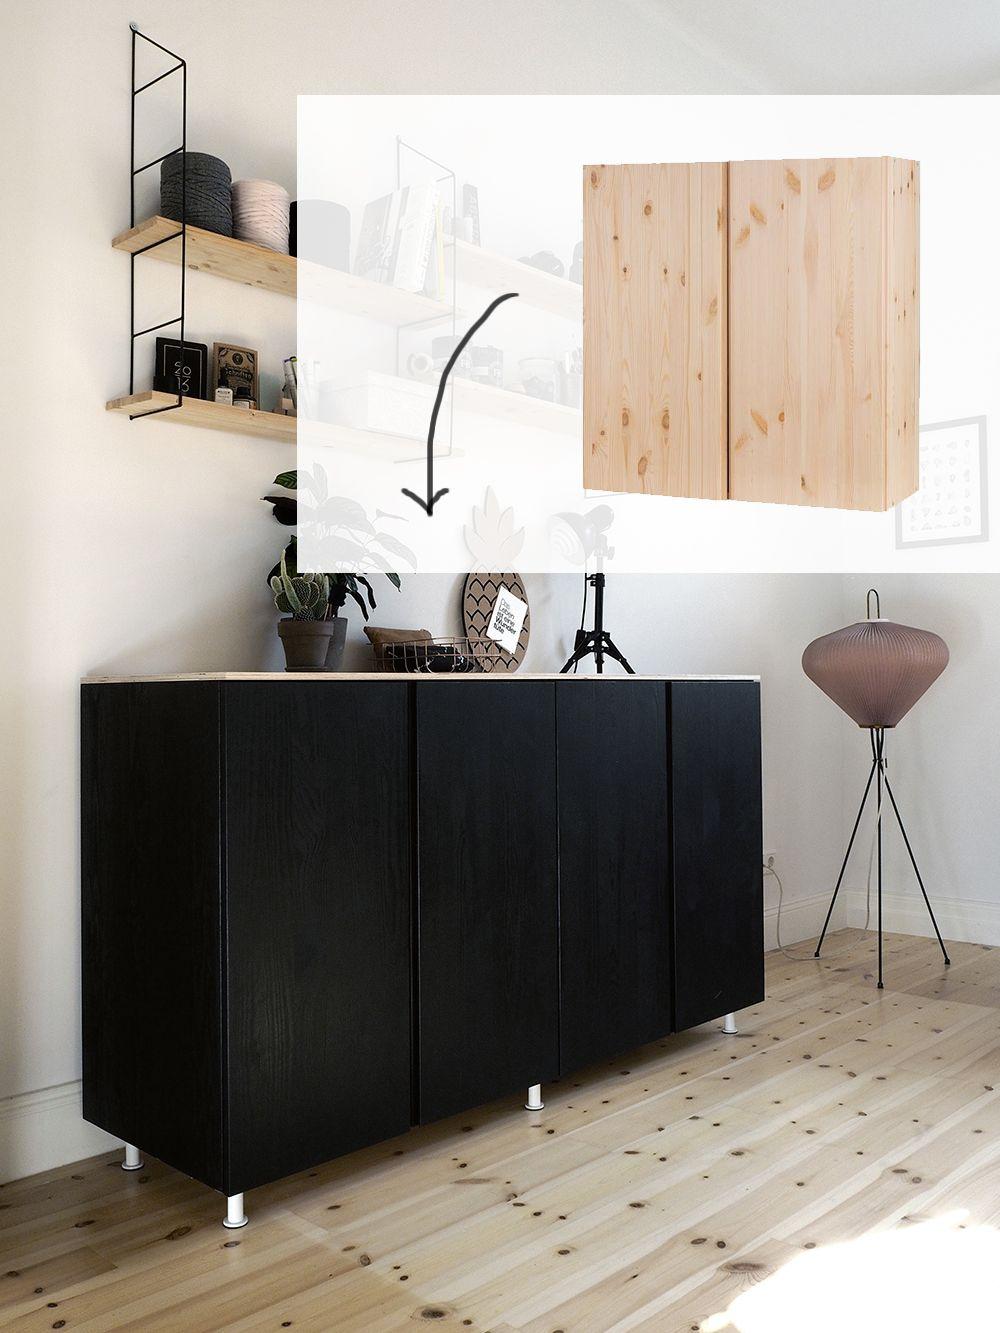 Ikea Kitchen Sideboard Hack